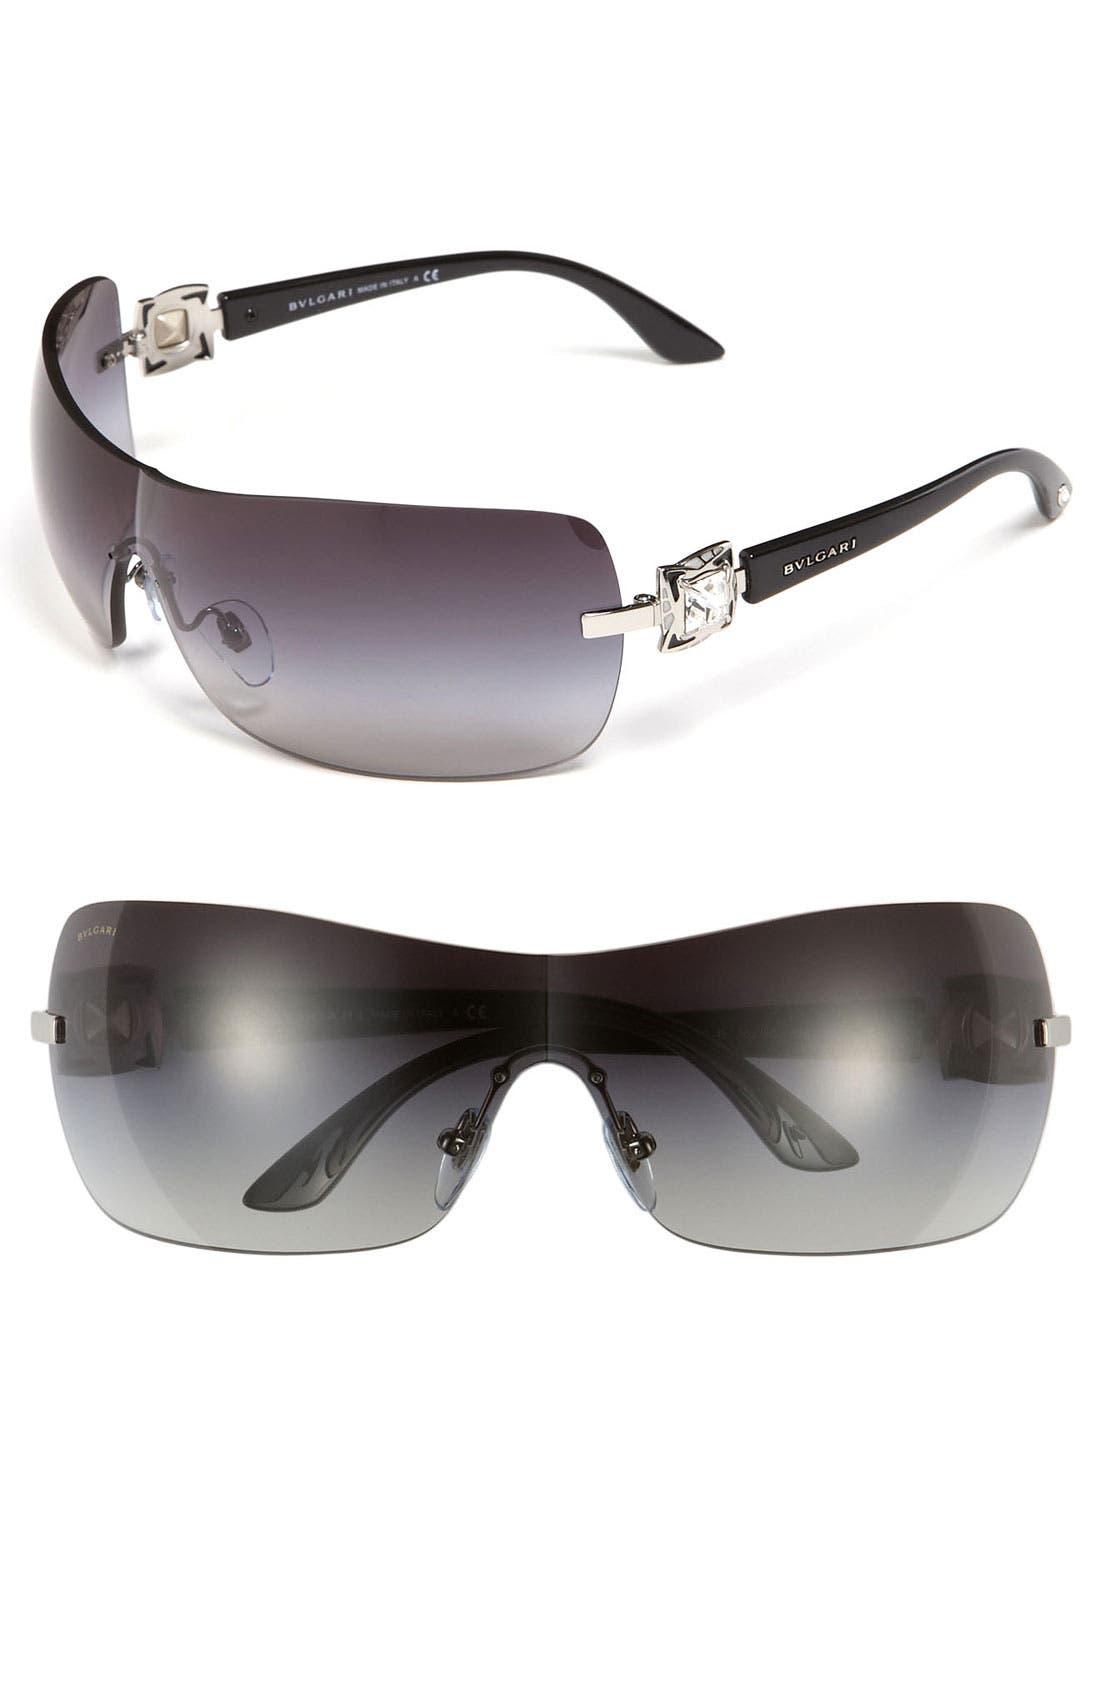 Alternate Image 1 Selected - BVLGARI 63mm Swarovski Crystal Shield Sunglasses